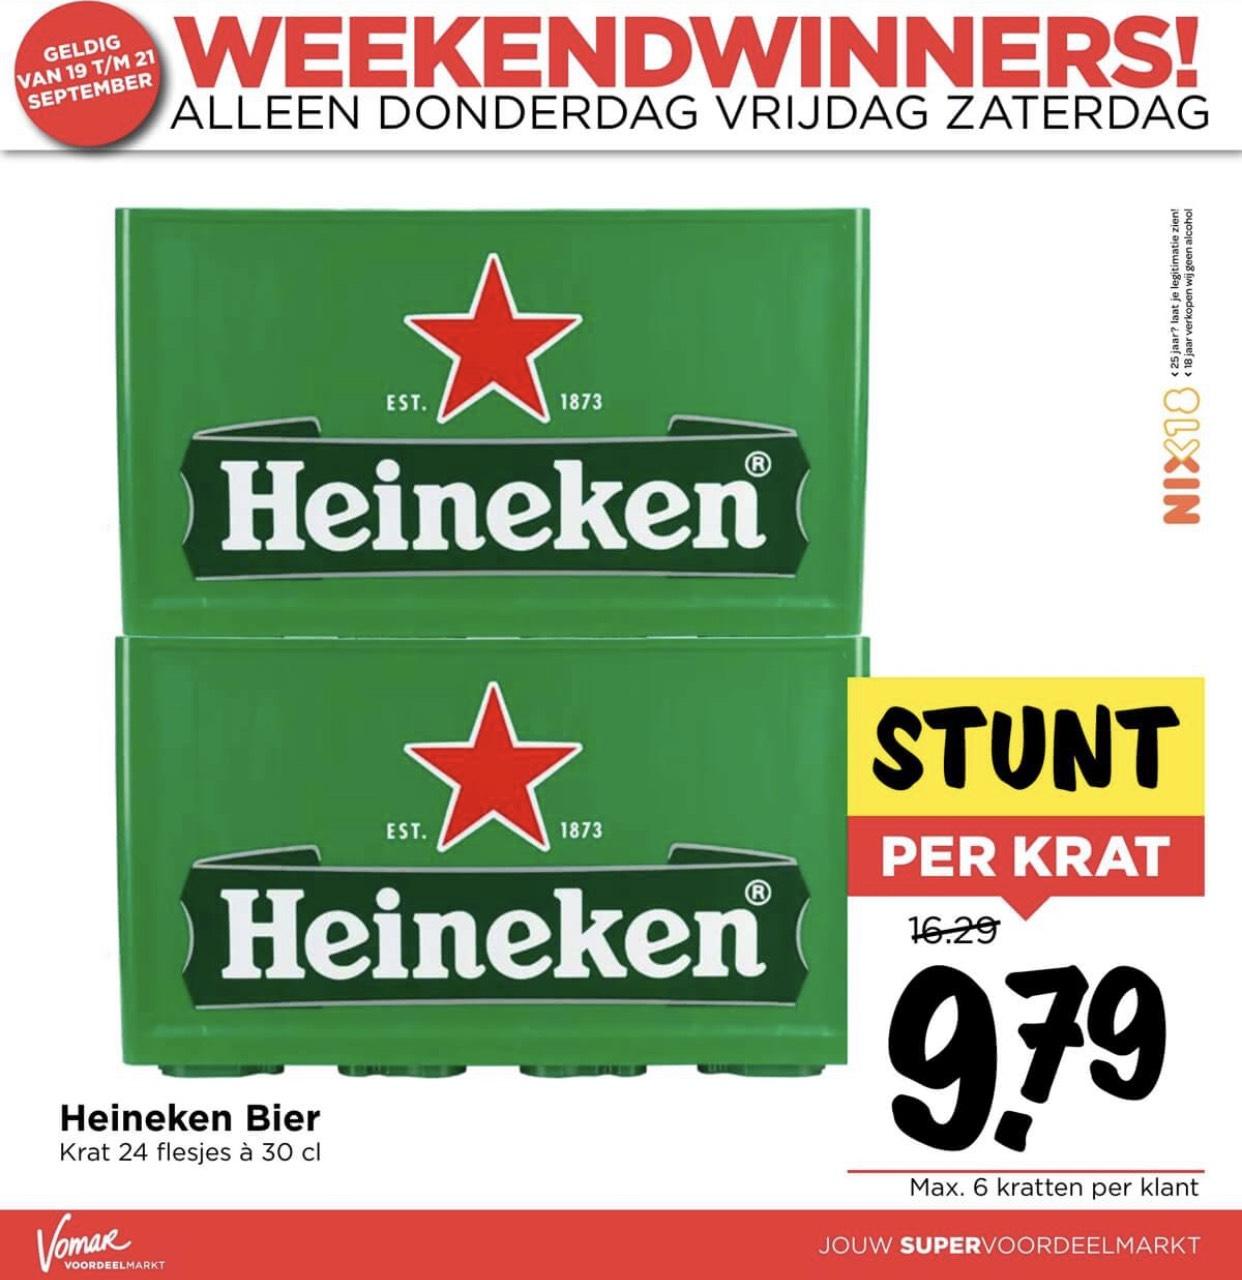 Heineken 9,79 ipv 16,29 @Vomar alleen dit weekend!